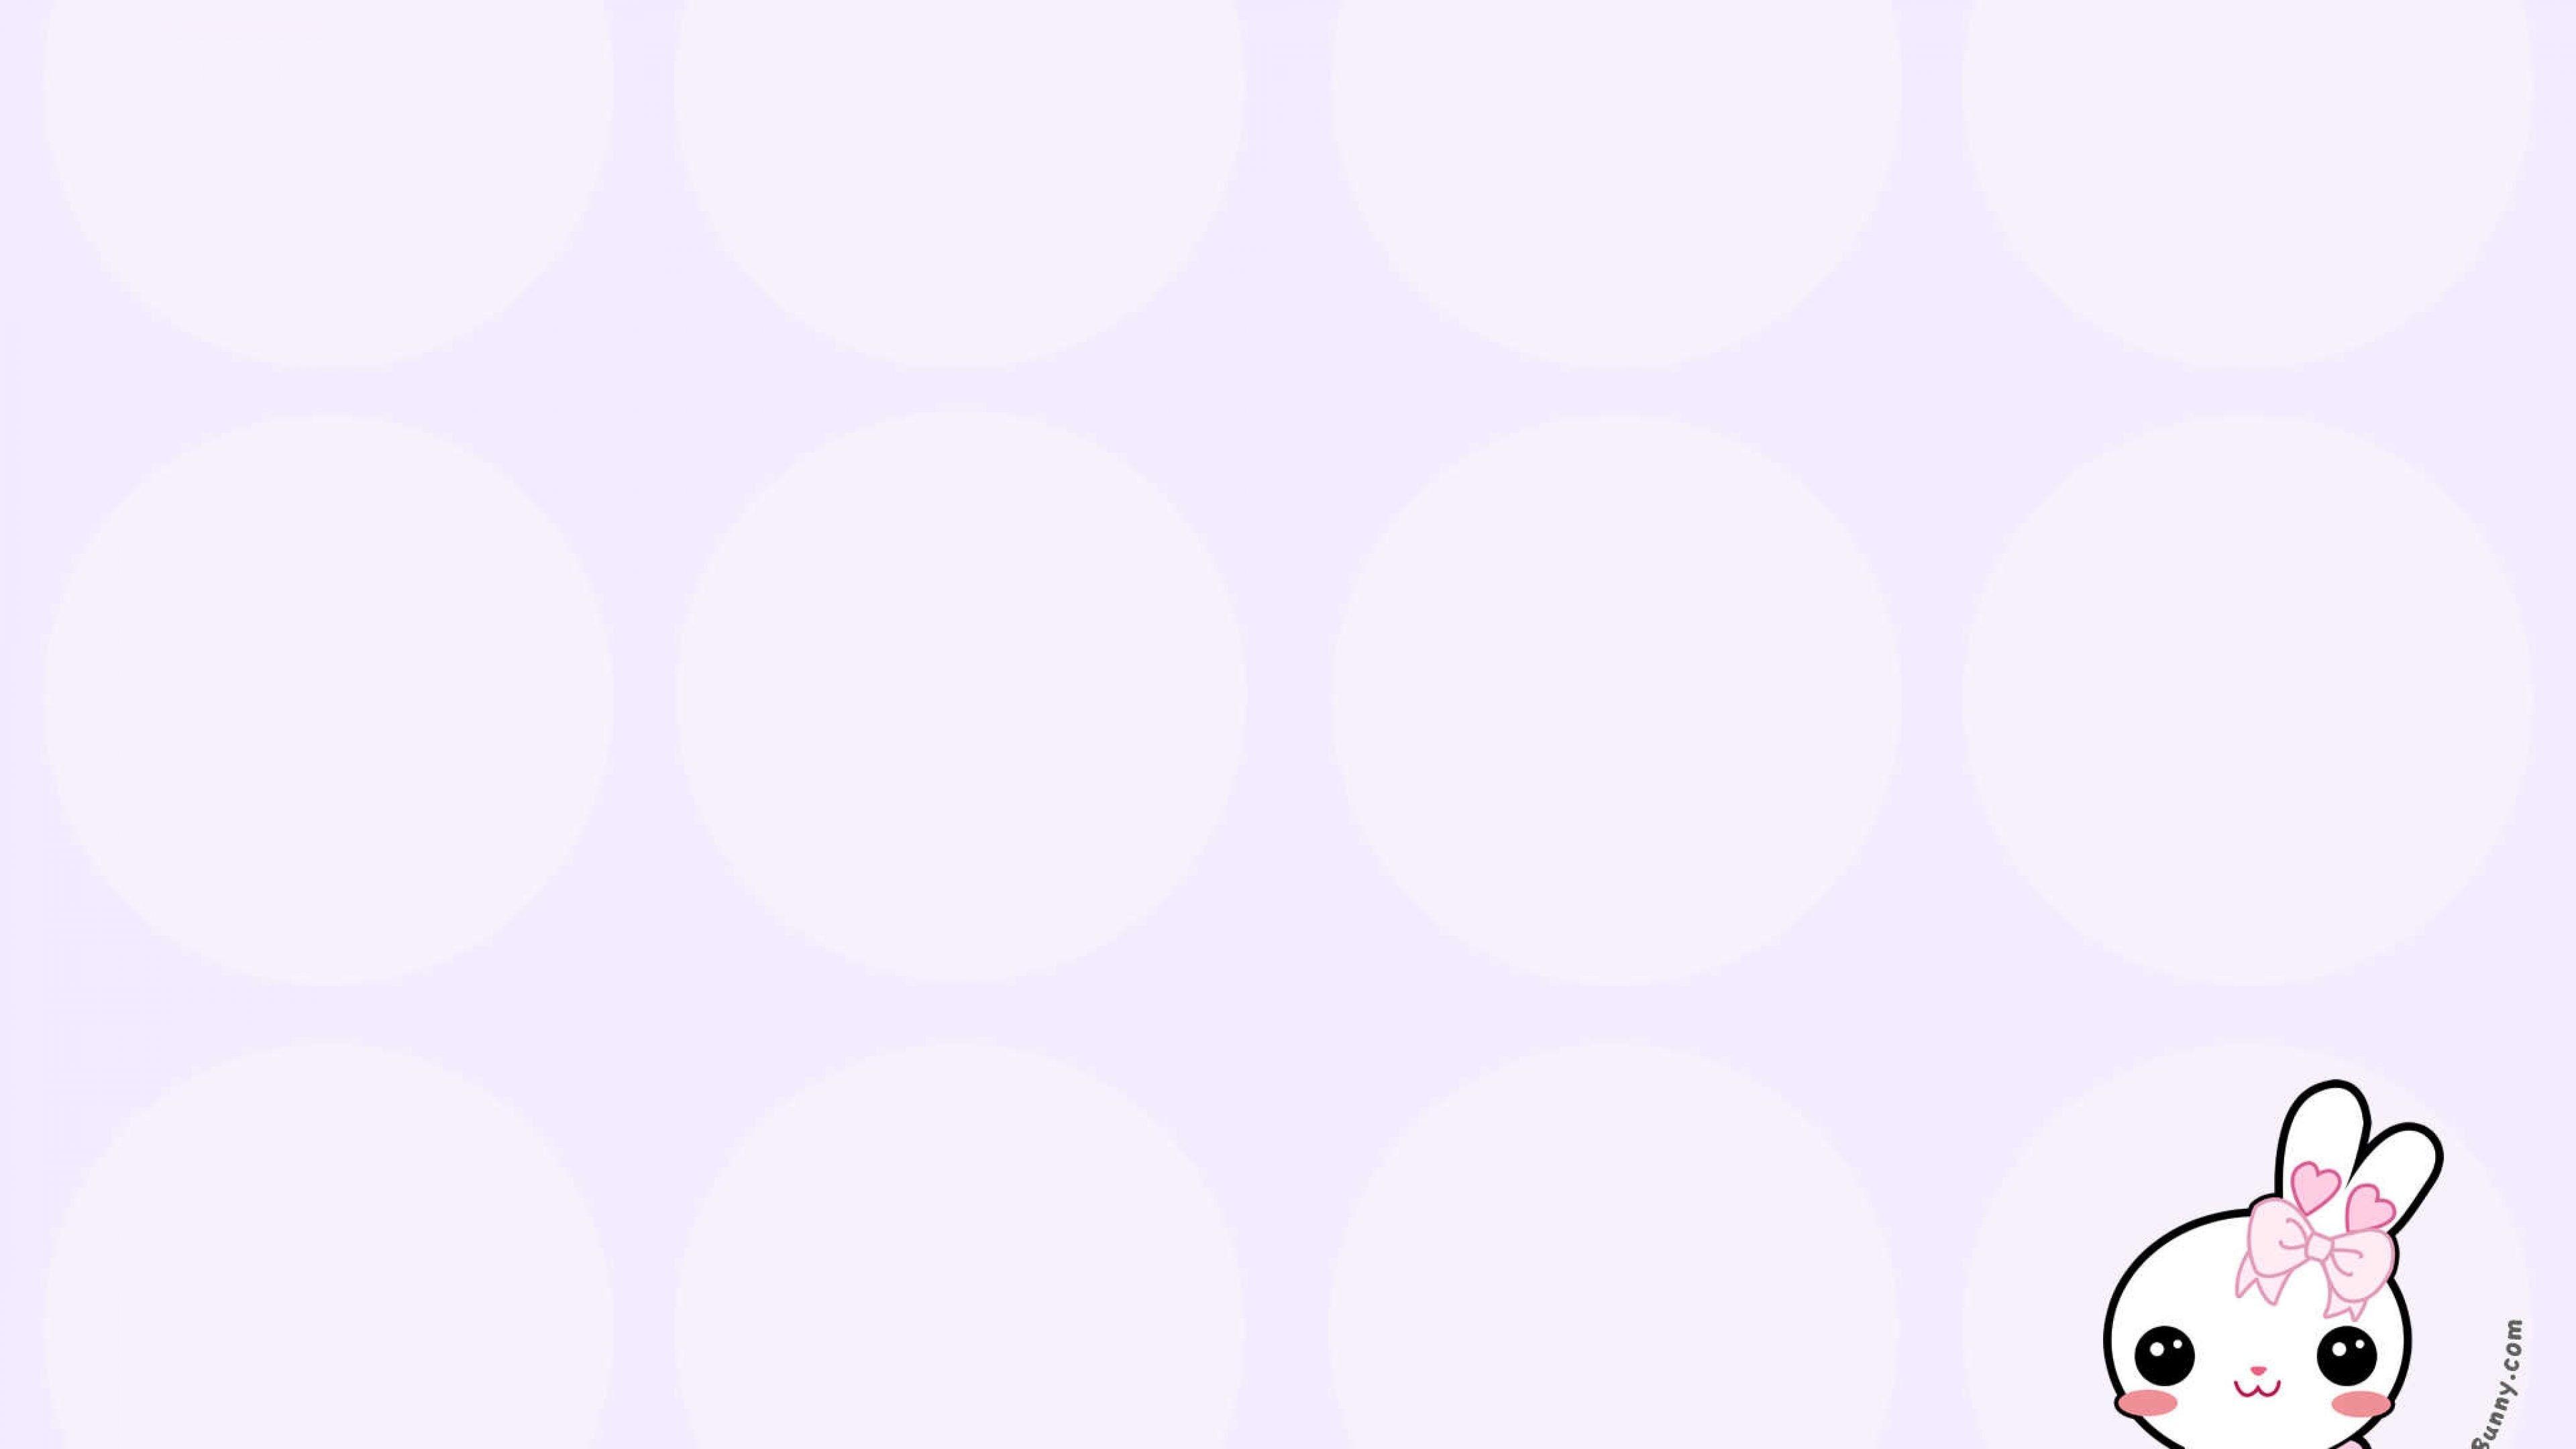 3840x2160 Cute Simple Backgrounds Cute Desktop Wallpaper Wallpaper Simple Backgrounds